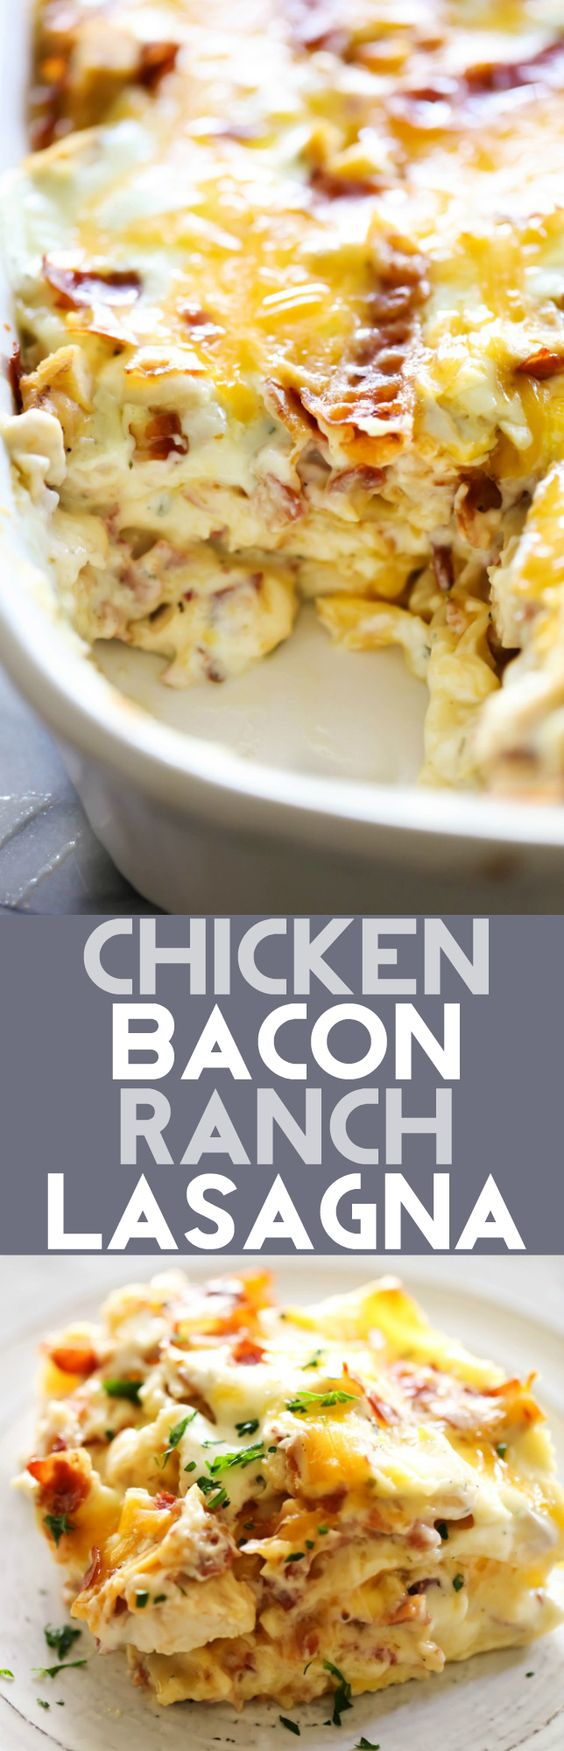 Chicken bacon ranch, Chicken bacon and Lasagna on Pinterest